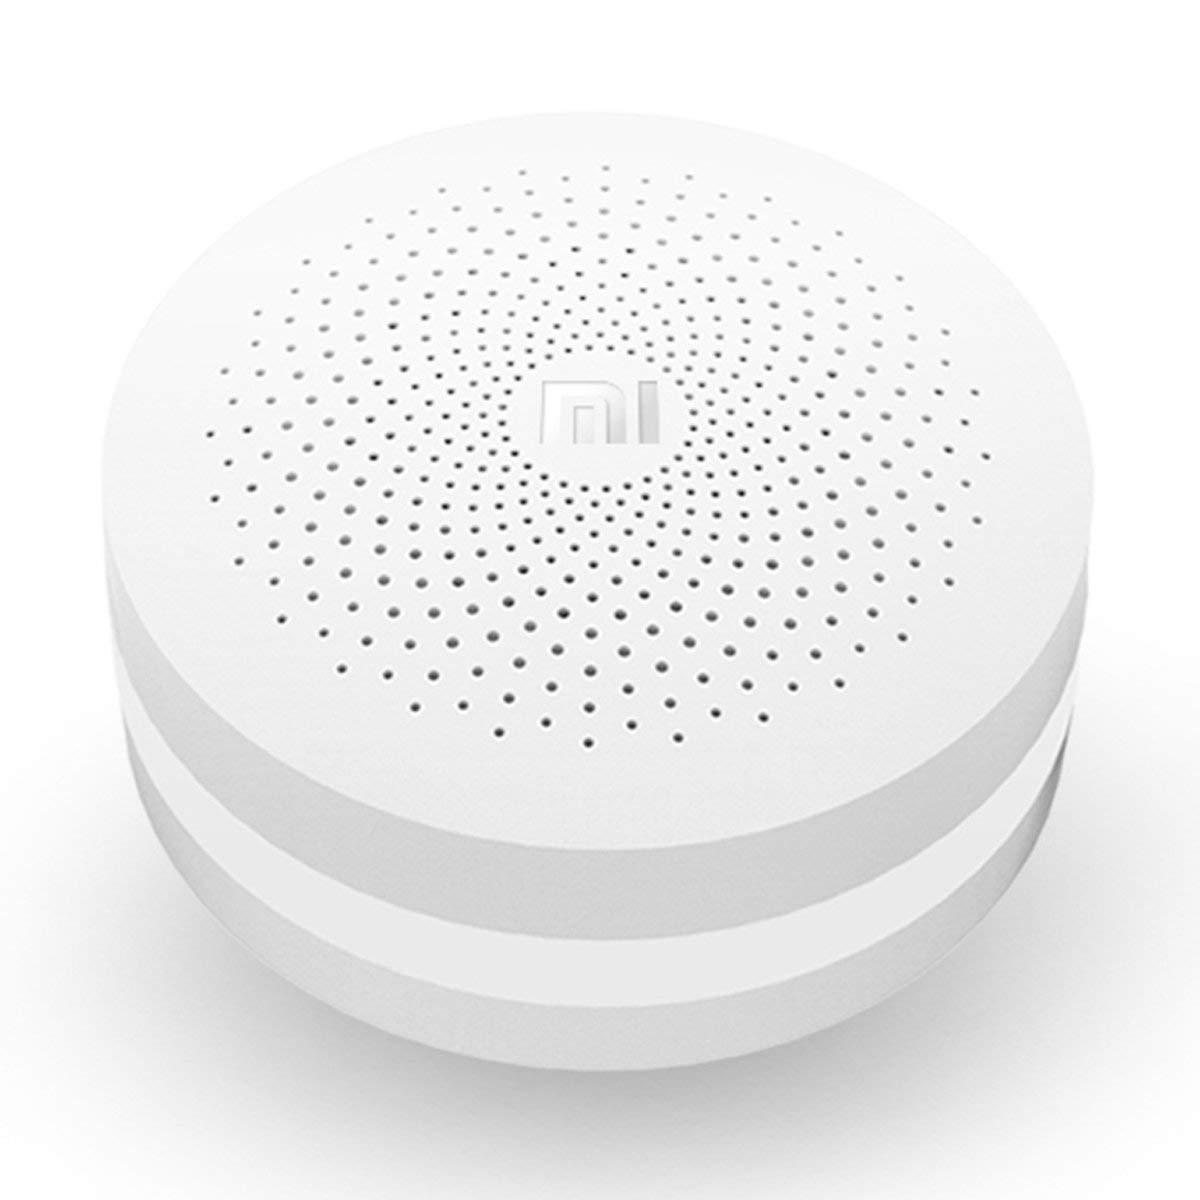 OLSUS Smart Home Multifunctional GateWay Temperature Door Sensor - White